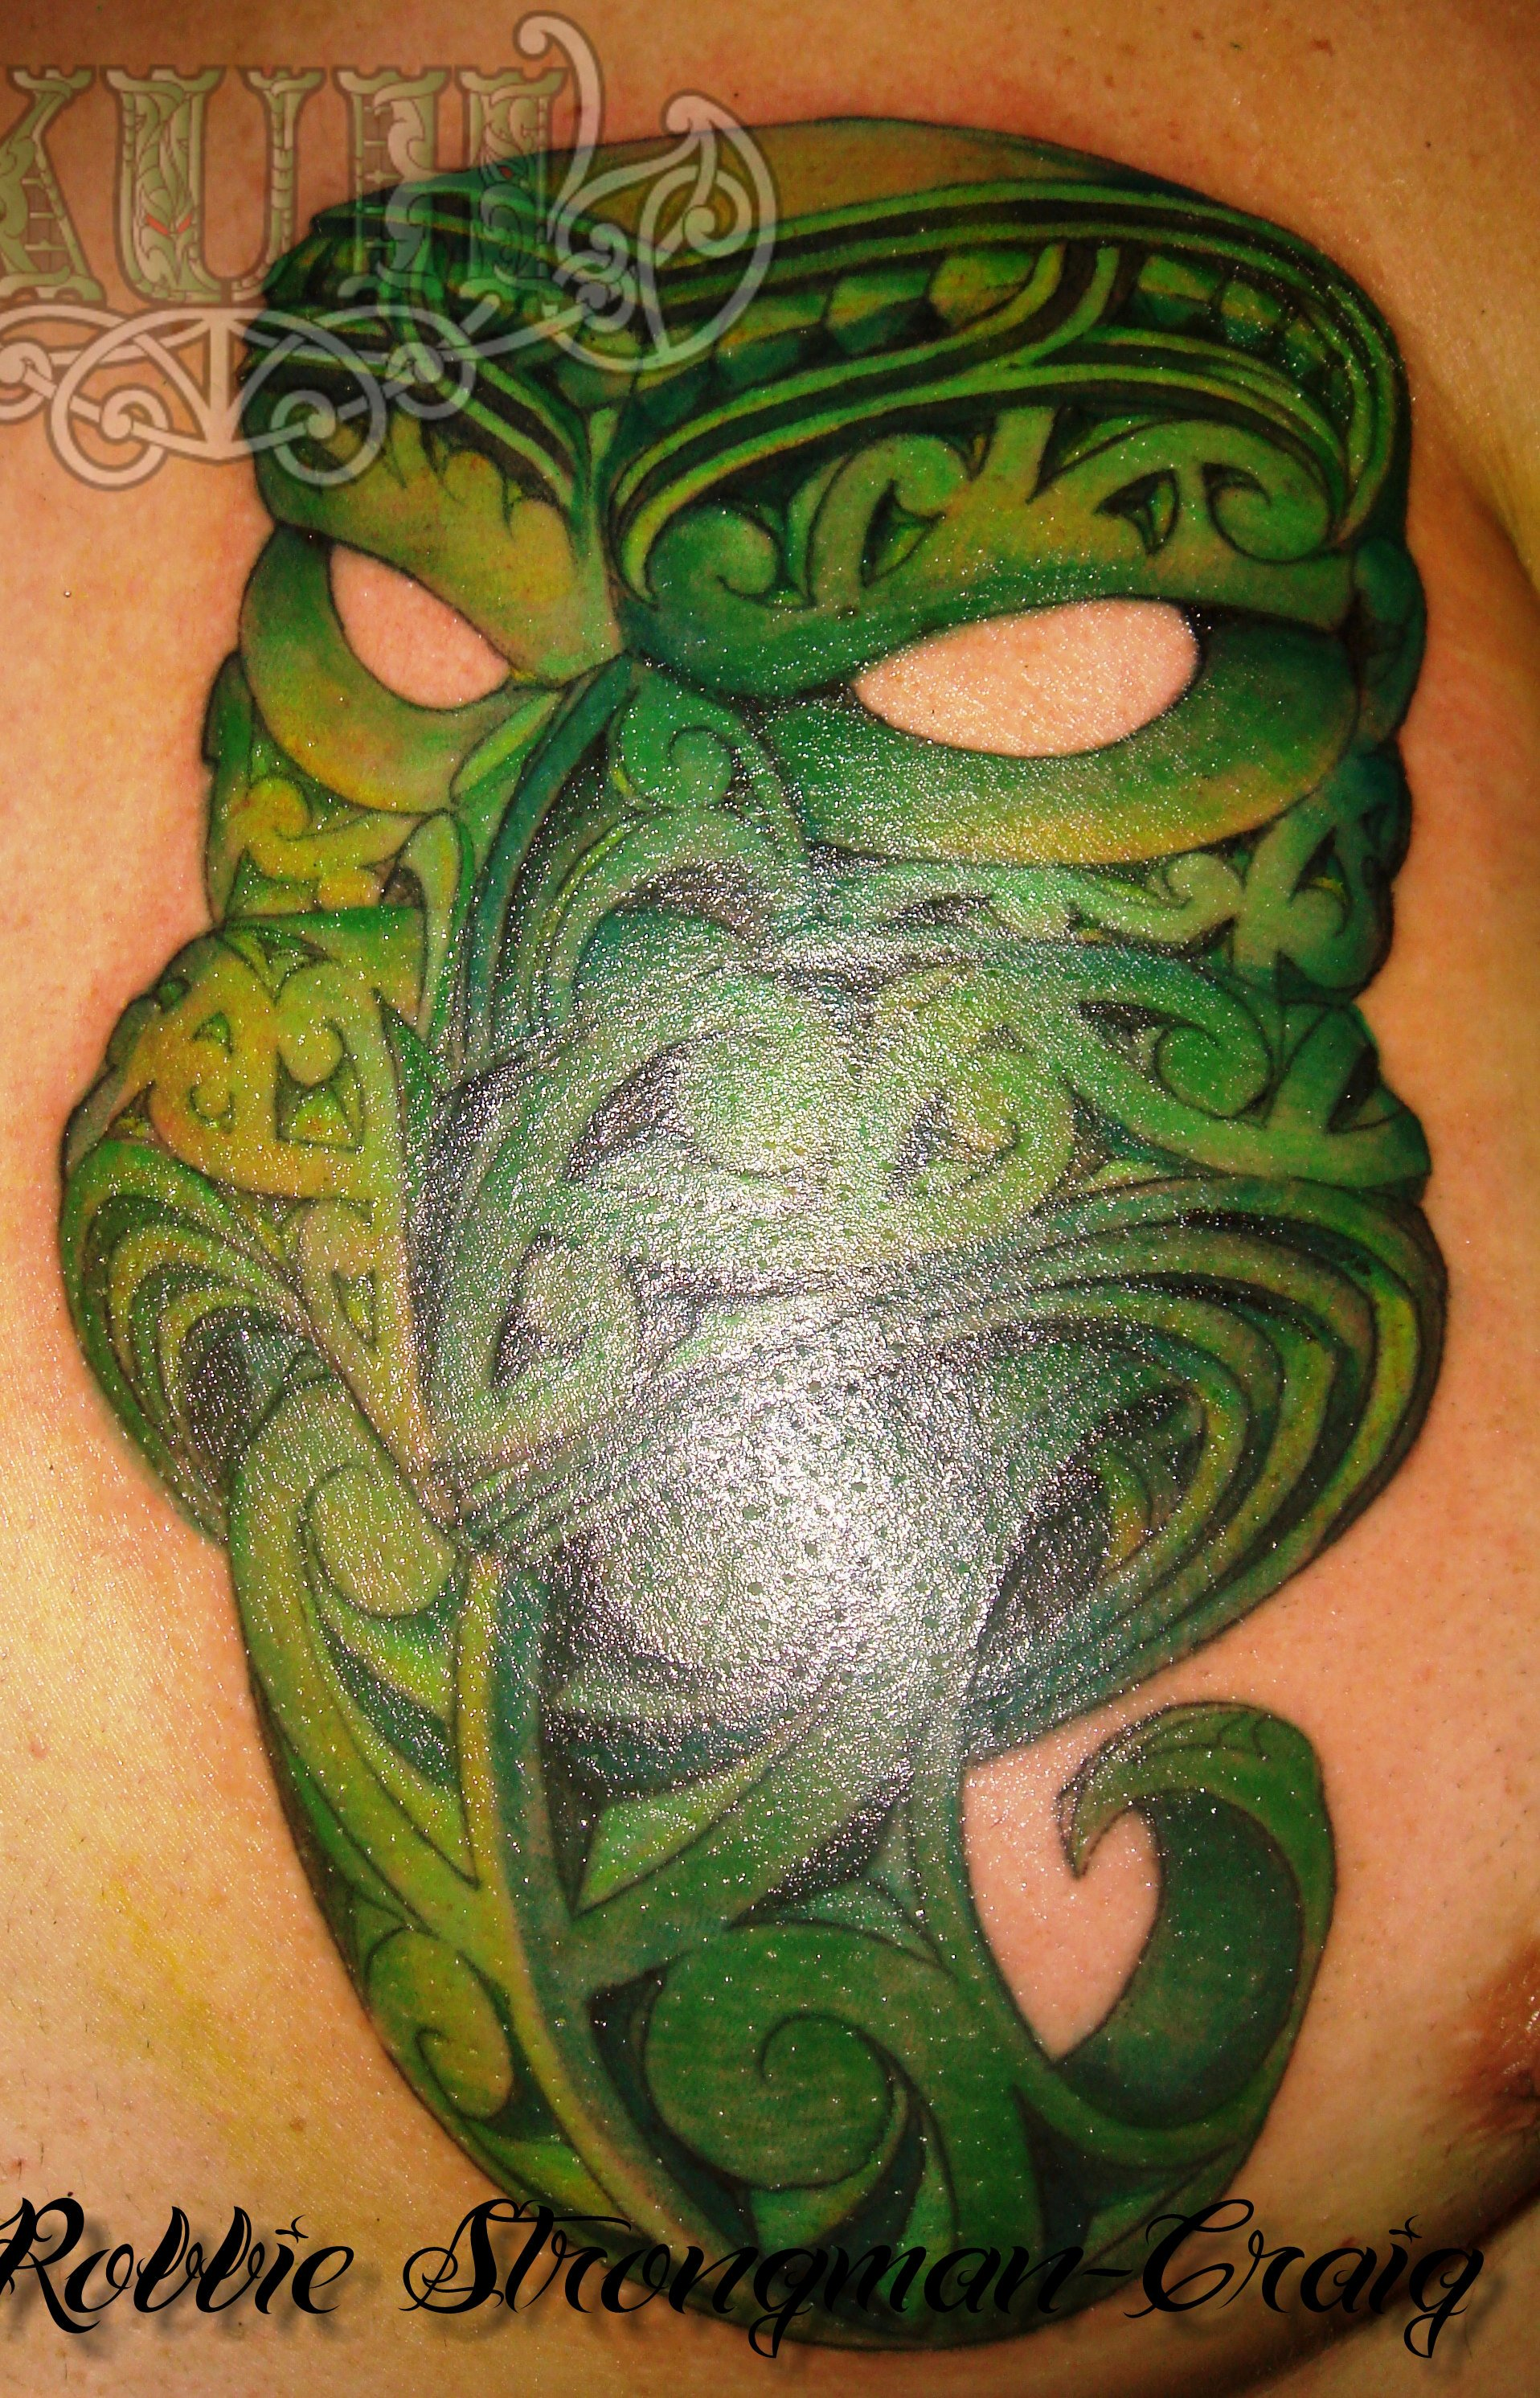 Kuh Ink Ta Moko And Tattoo Auckland